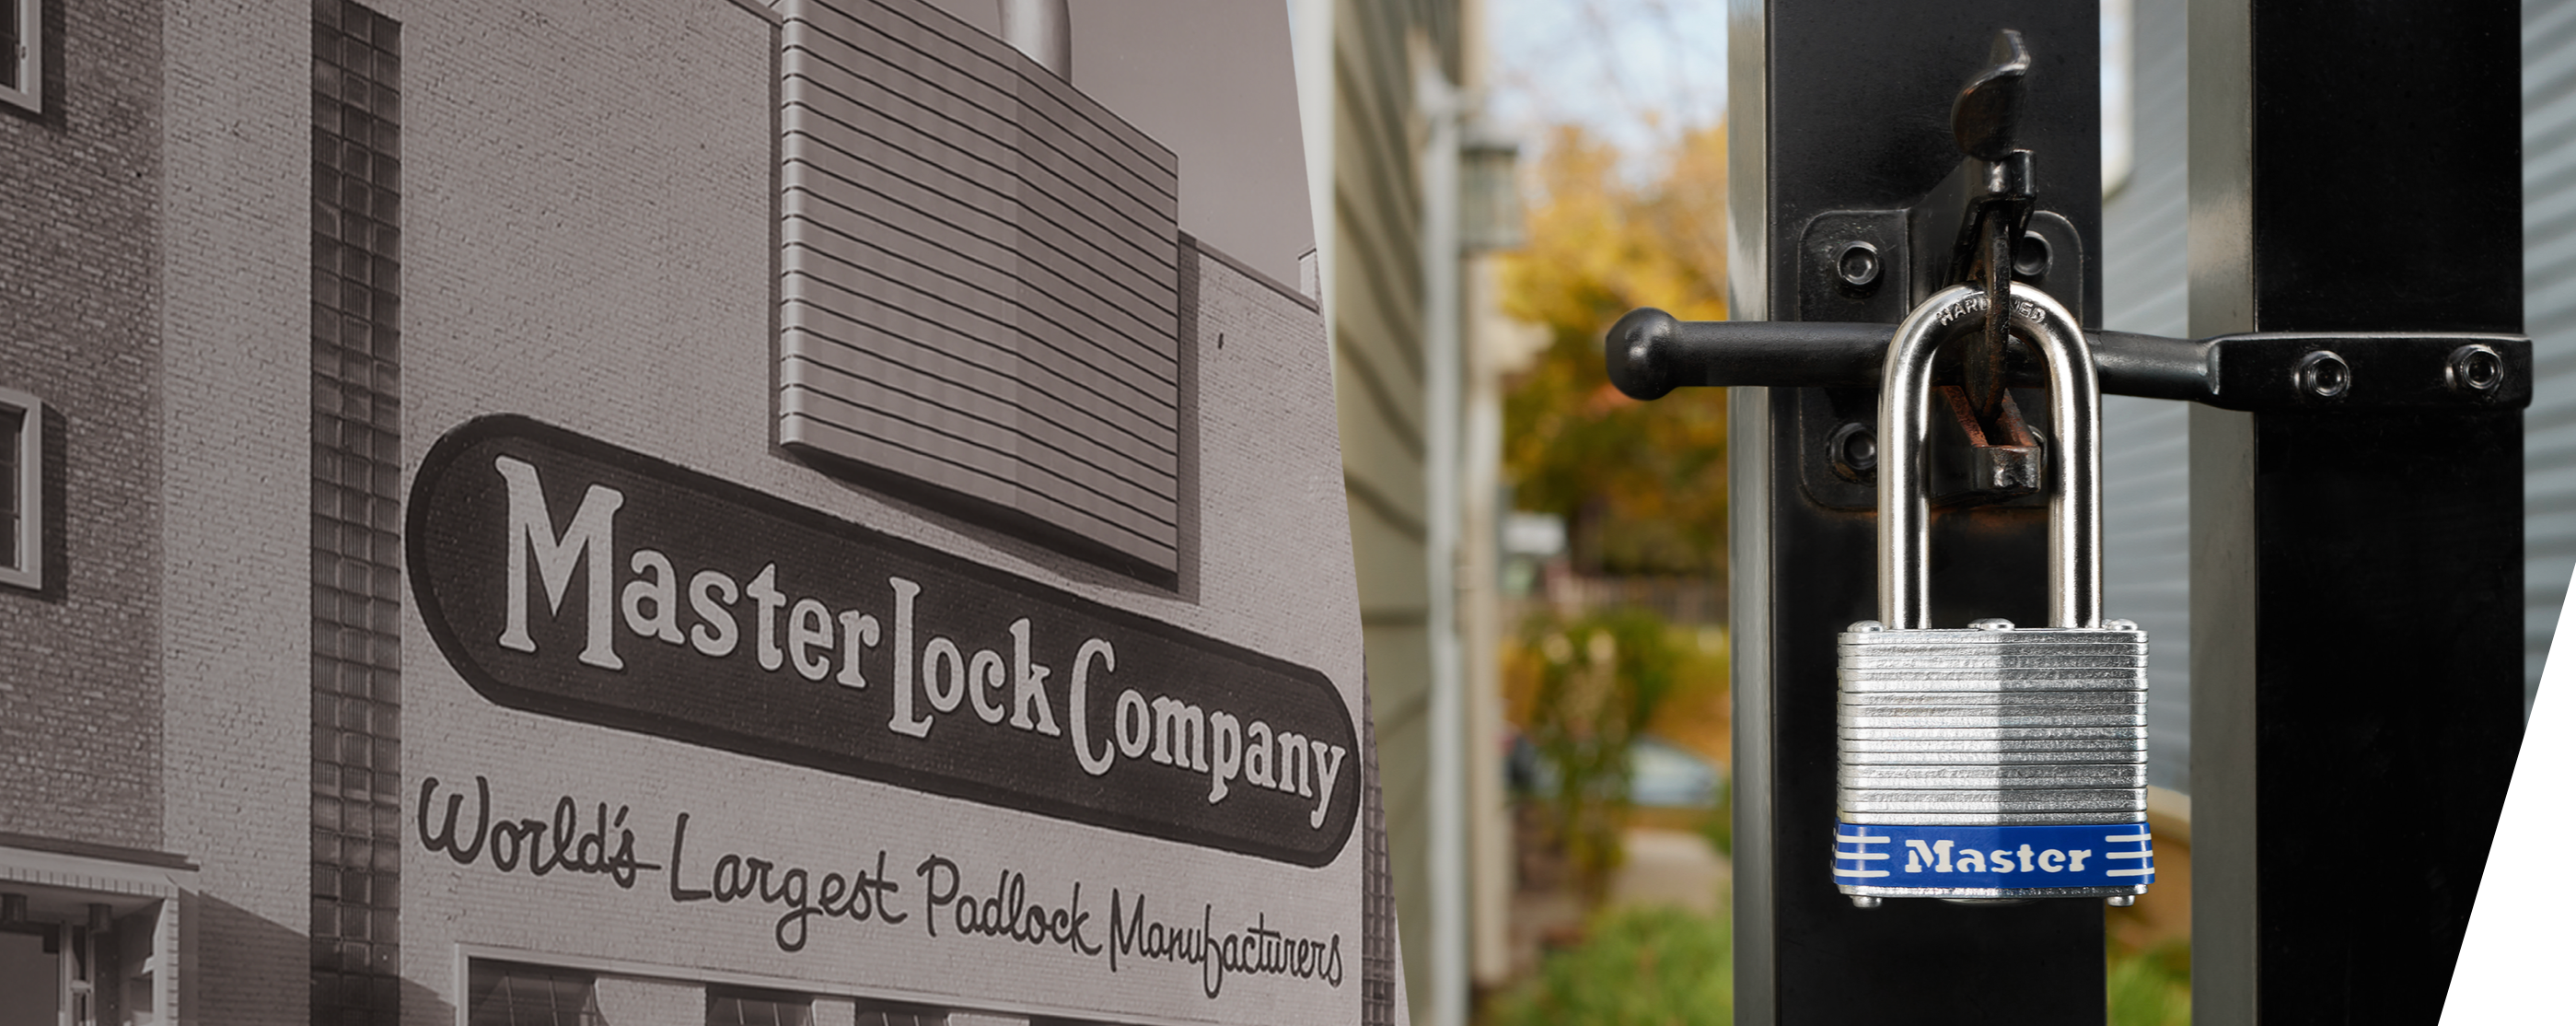 Master Lock historic building with laminated padlock on fence